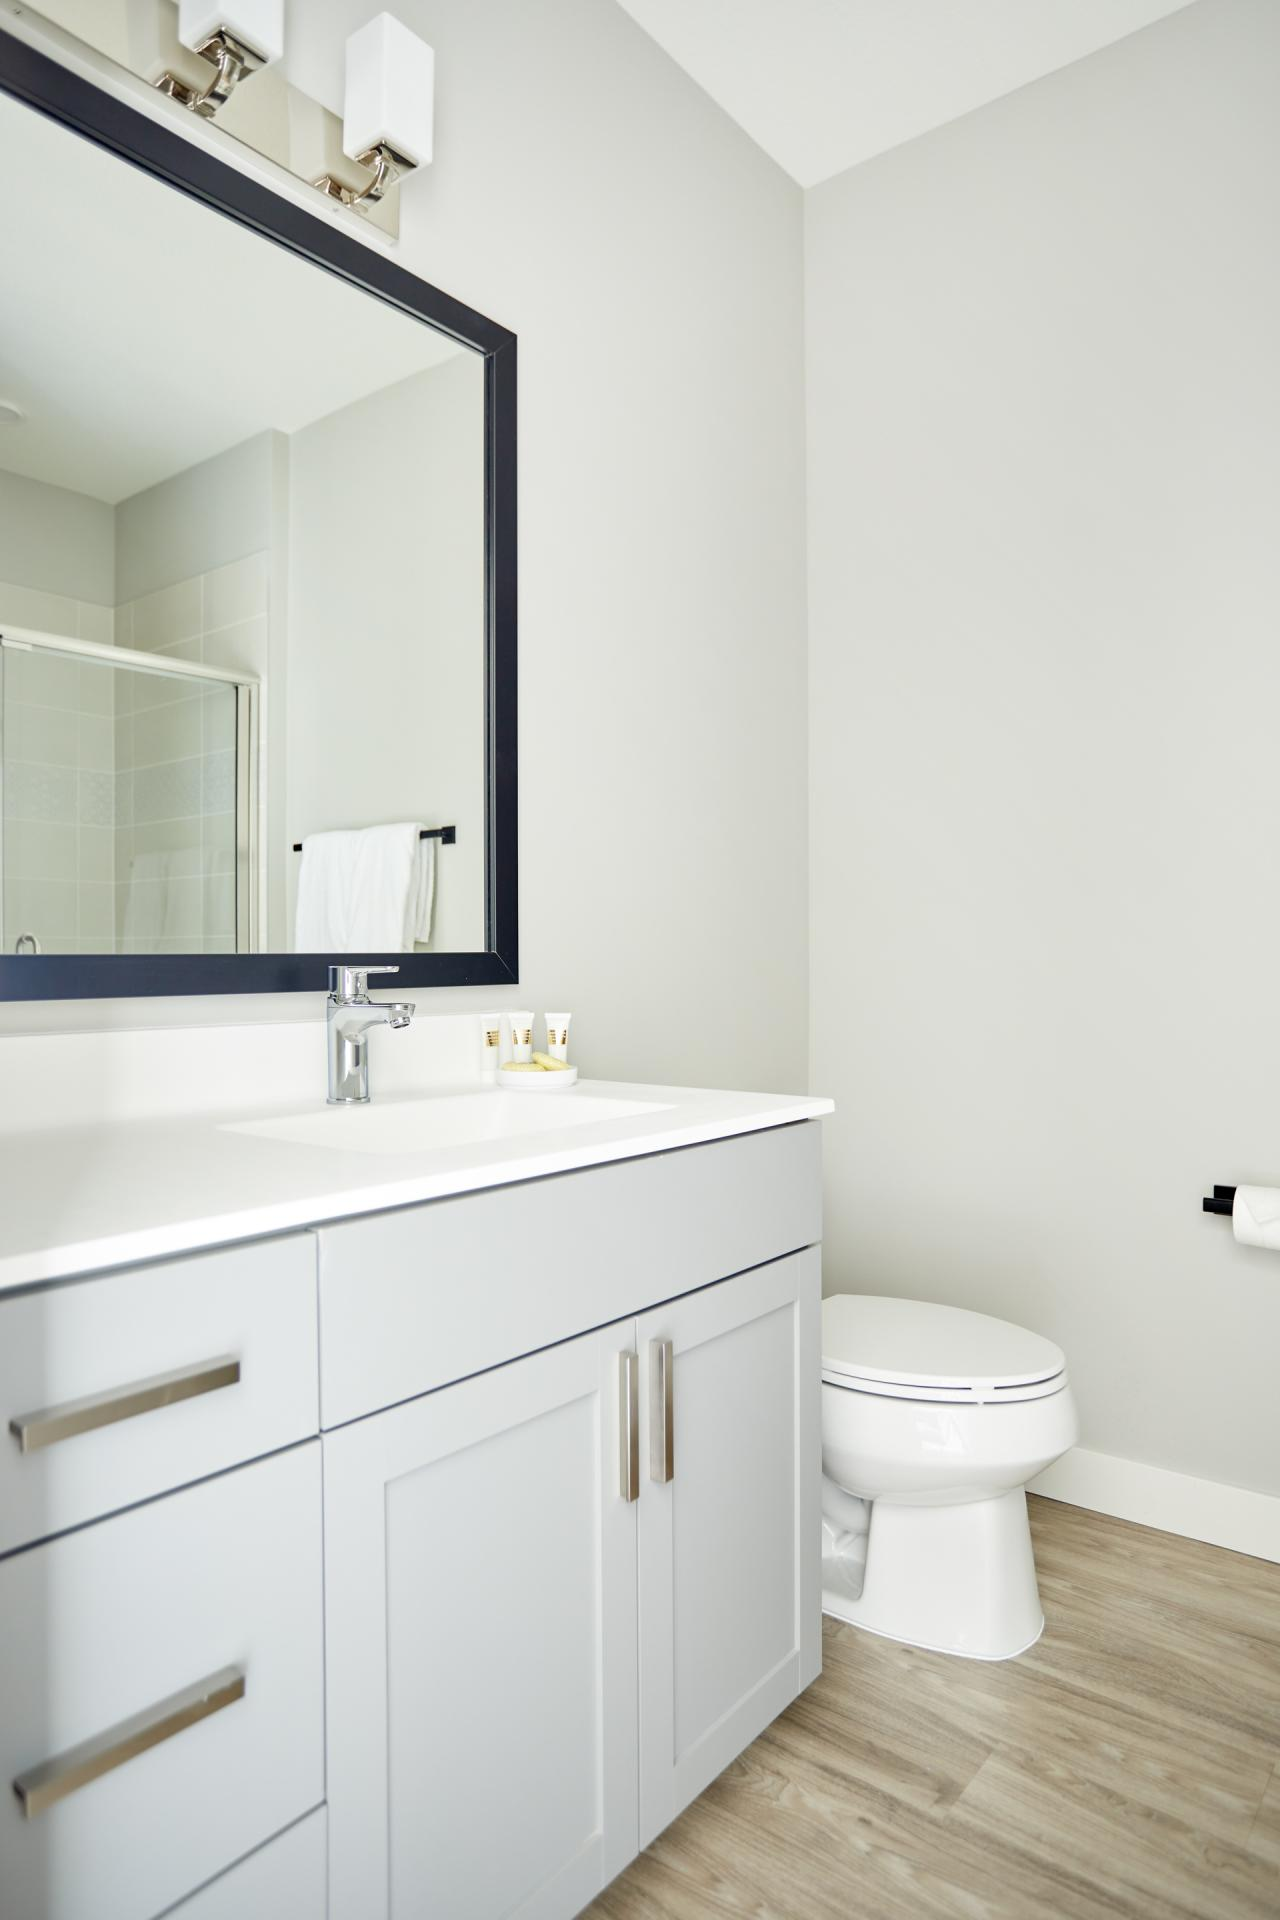 Bathroom at Vicinity Apartments, Centre, Minneapolis